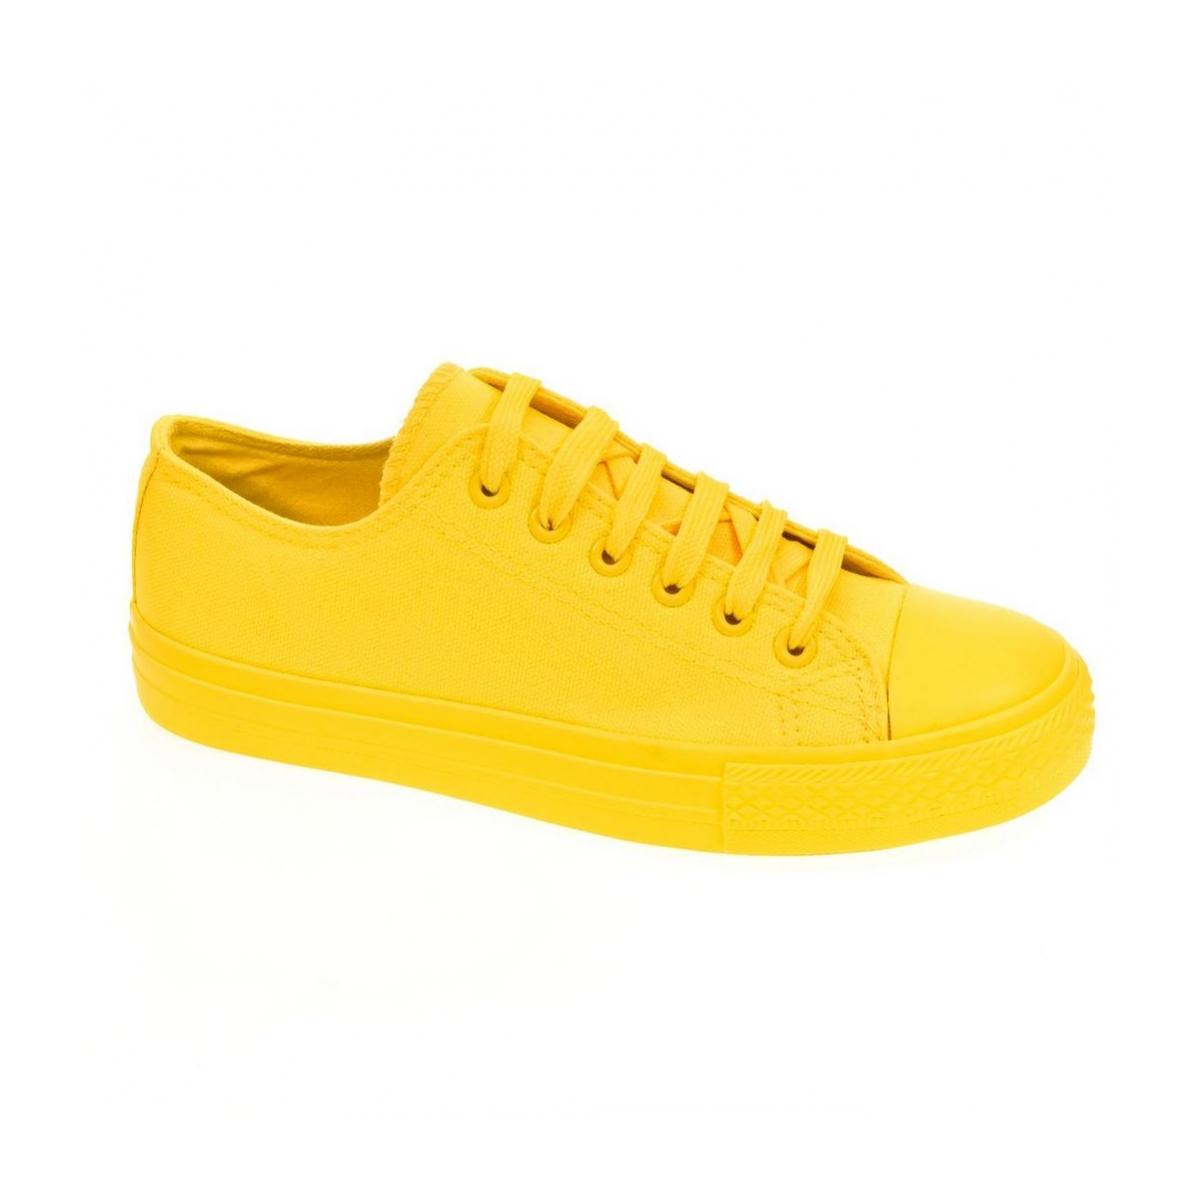 bcbebee4d1cd7 Dámske žlté tenisky REINA | Johnc.sk